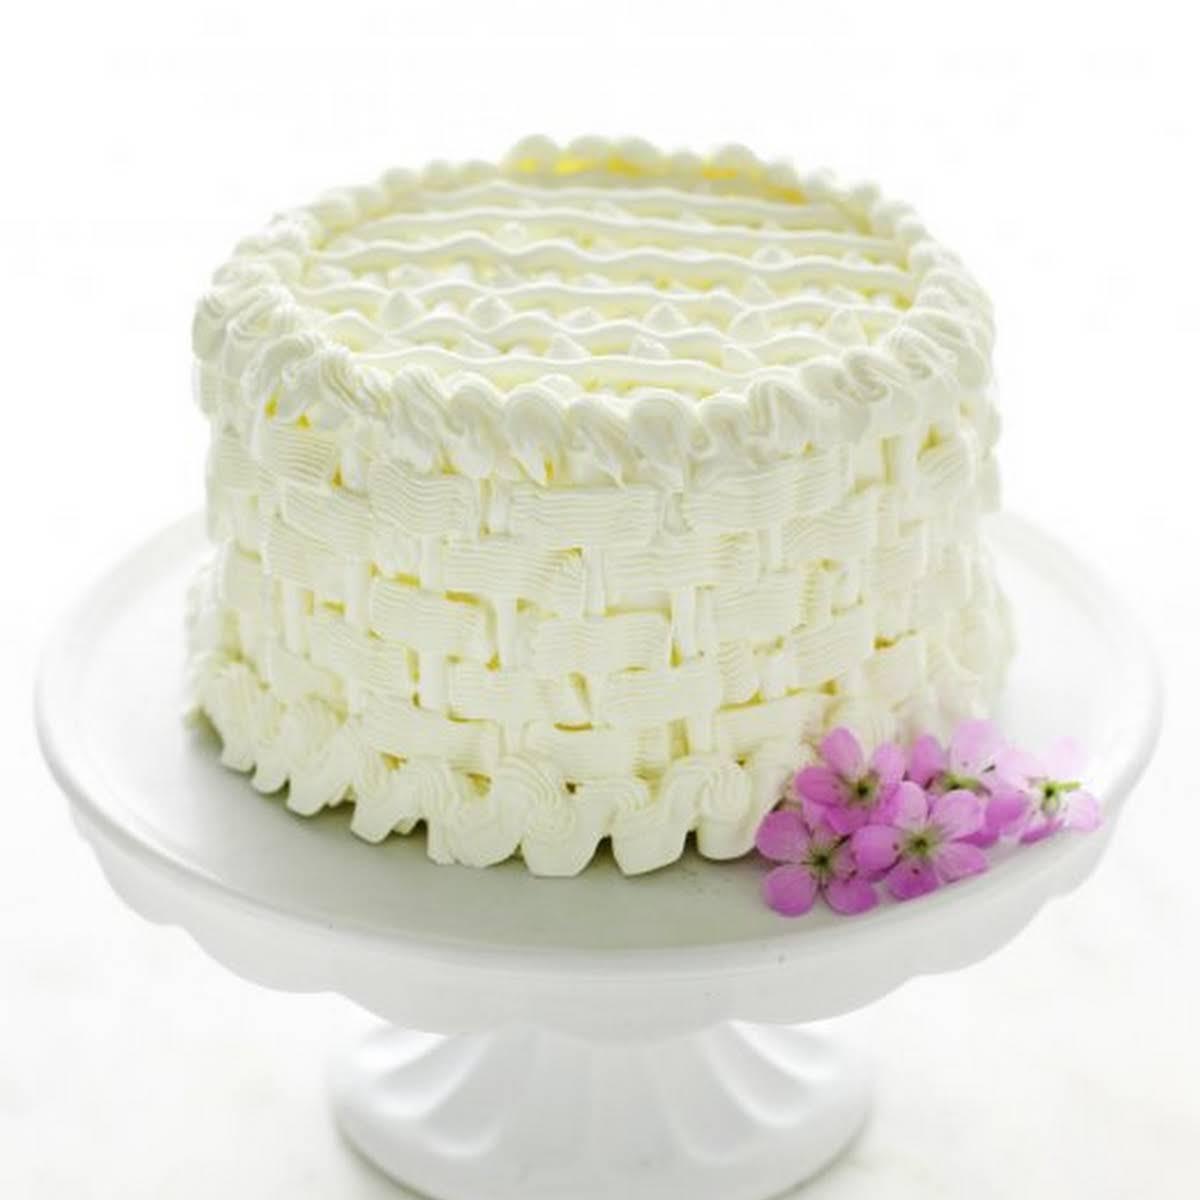 Remarkable Orange Butter Cake Martha Stewart Recipes Yummly Funny Birthday Cards Online Fluifree Goldxyz